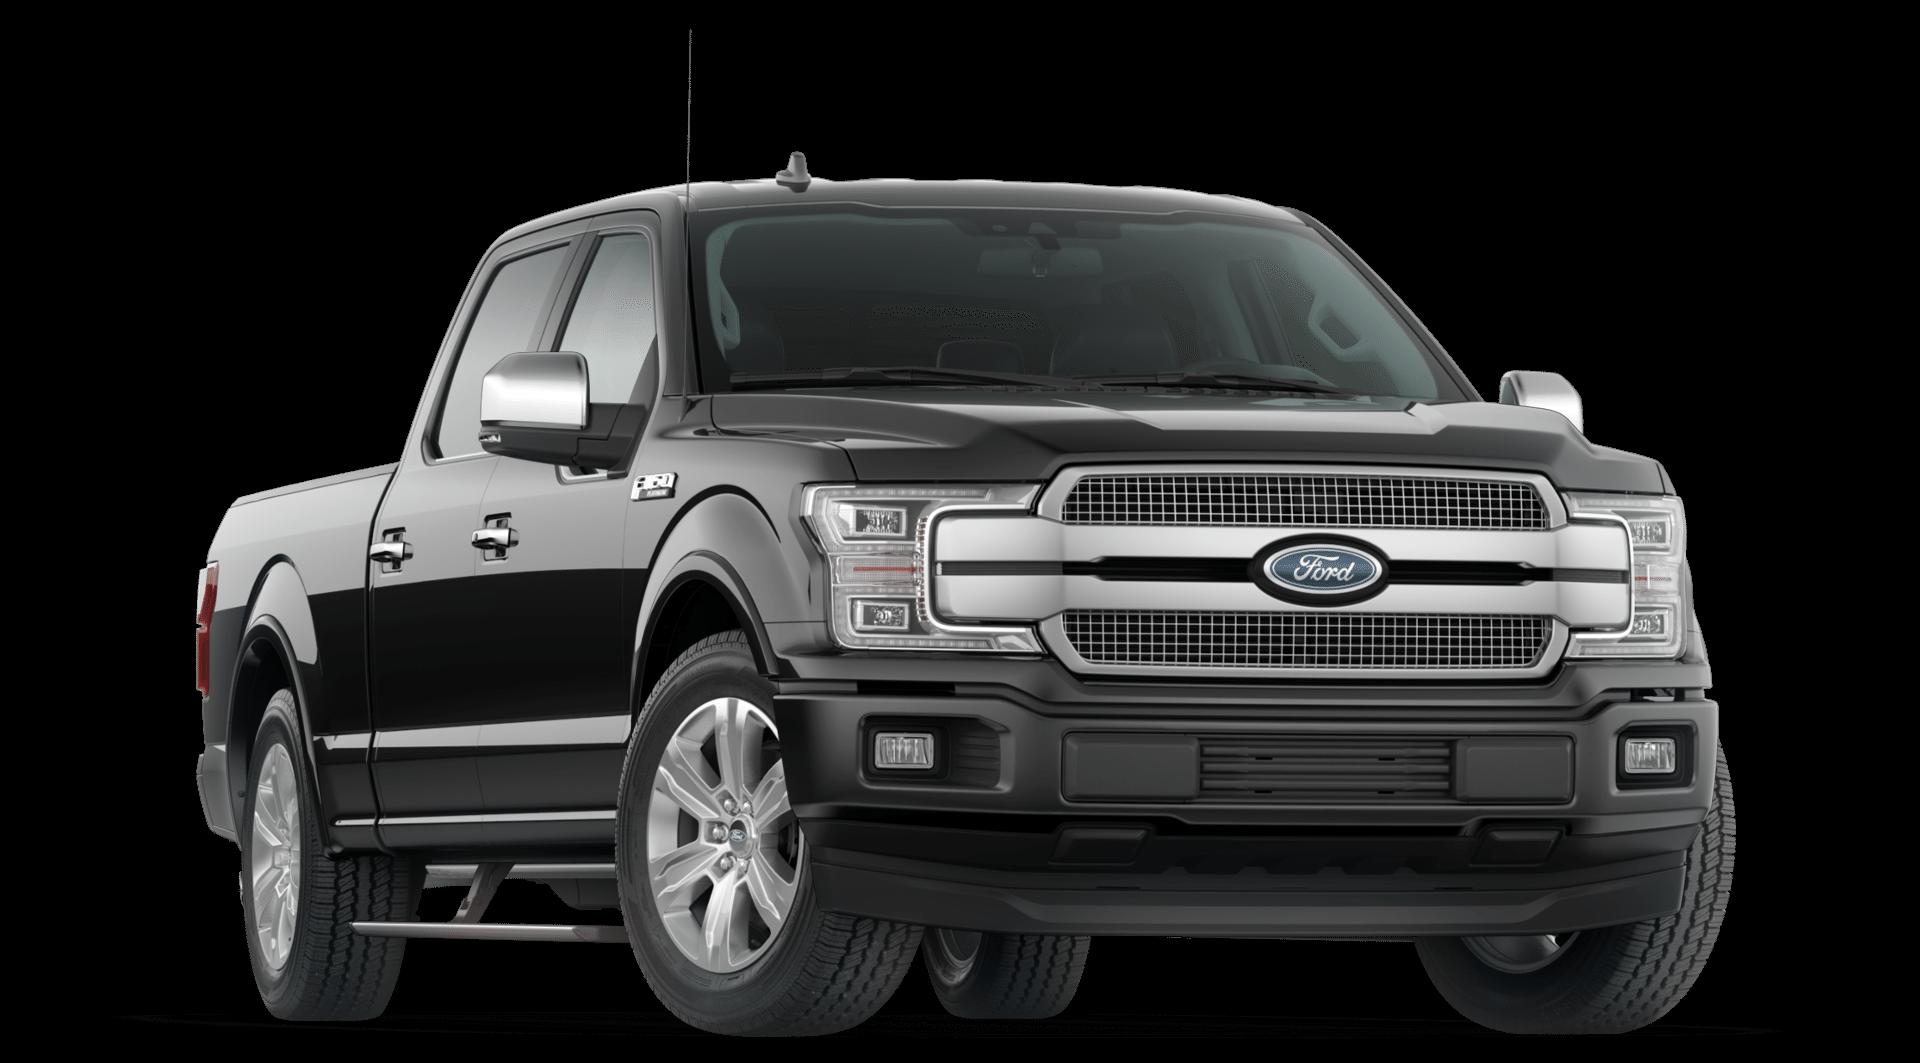 2019 Ford F 150 Build Price Ford F150 Ford Deals Hybrid Car